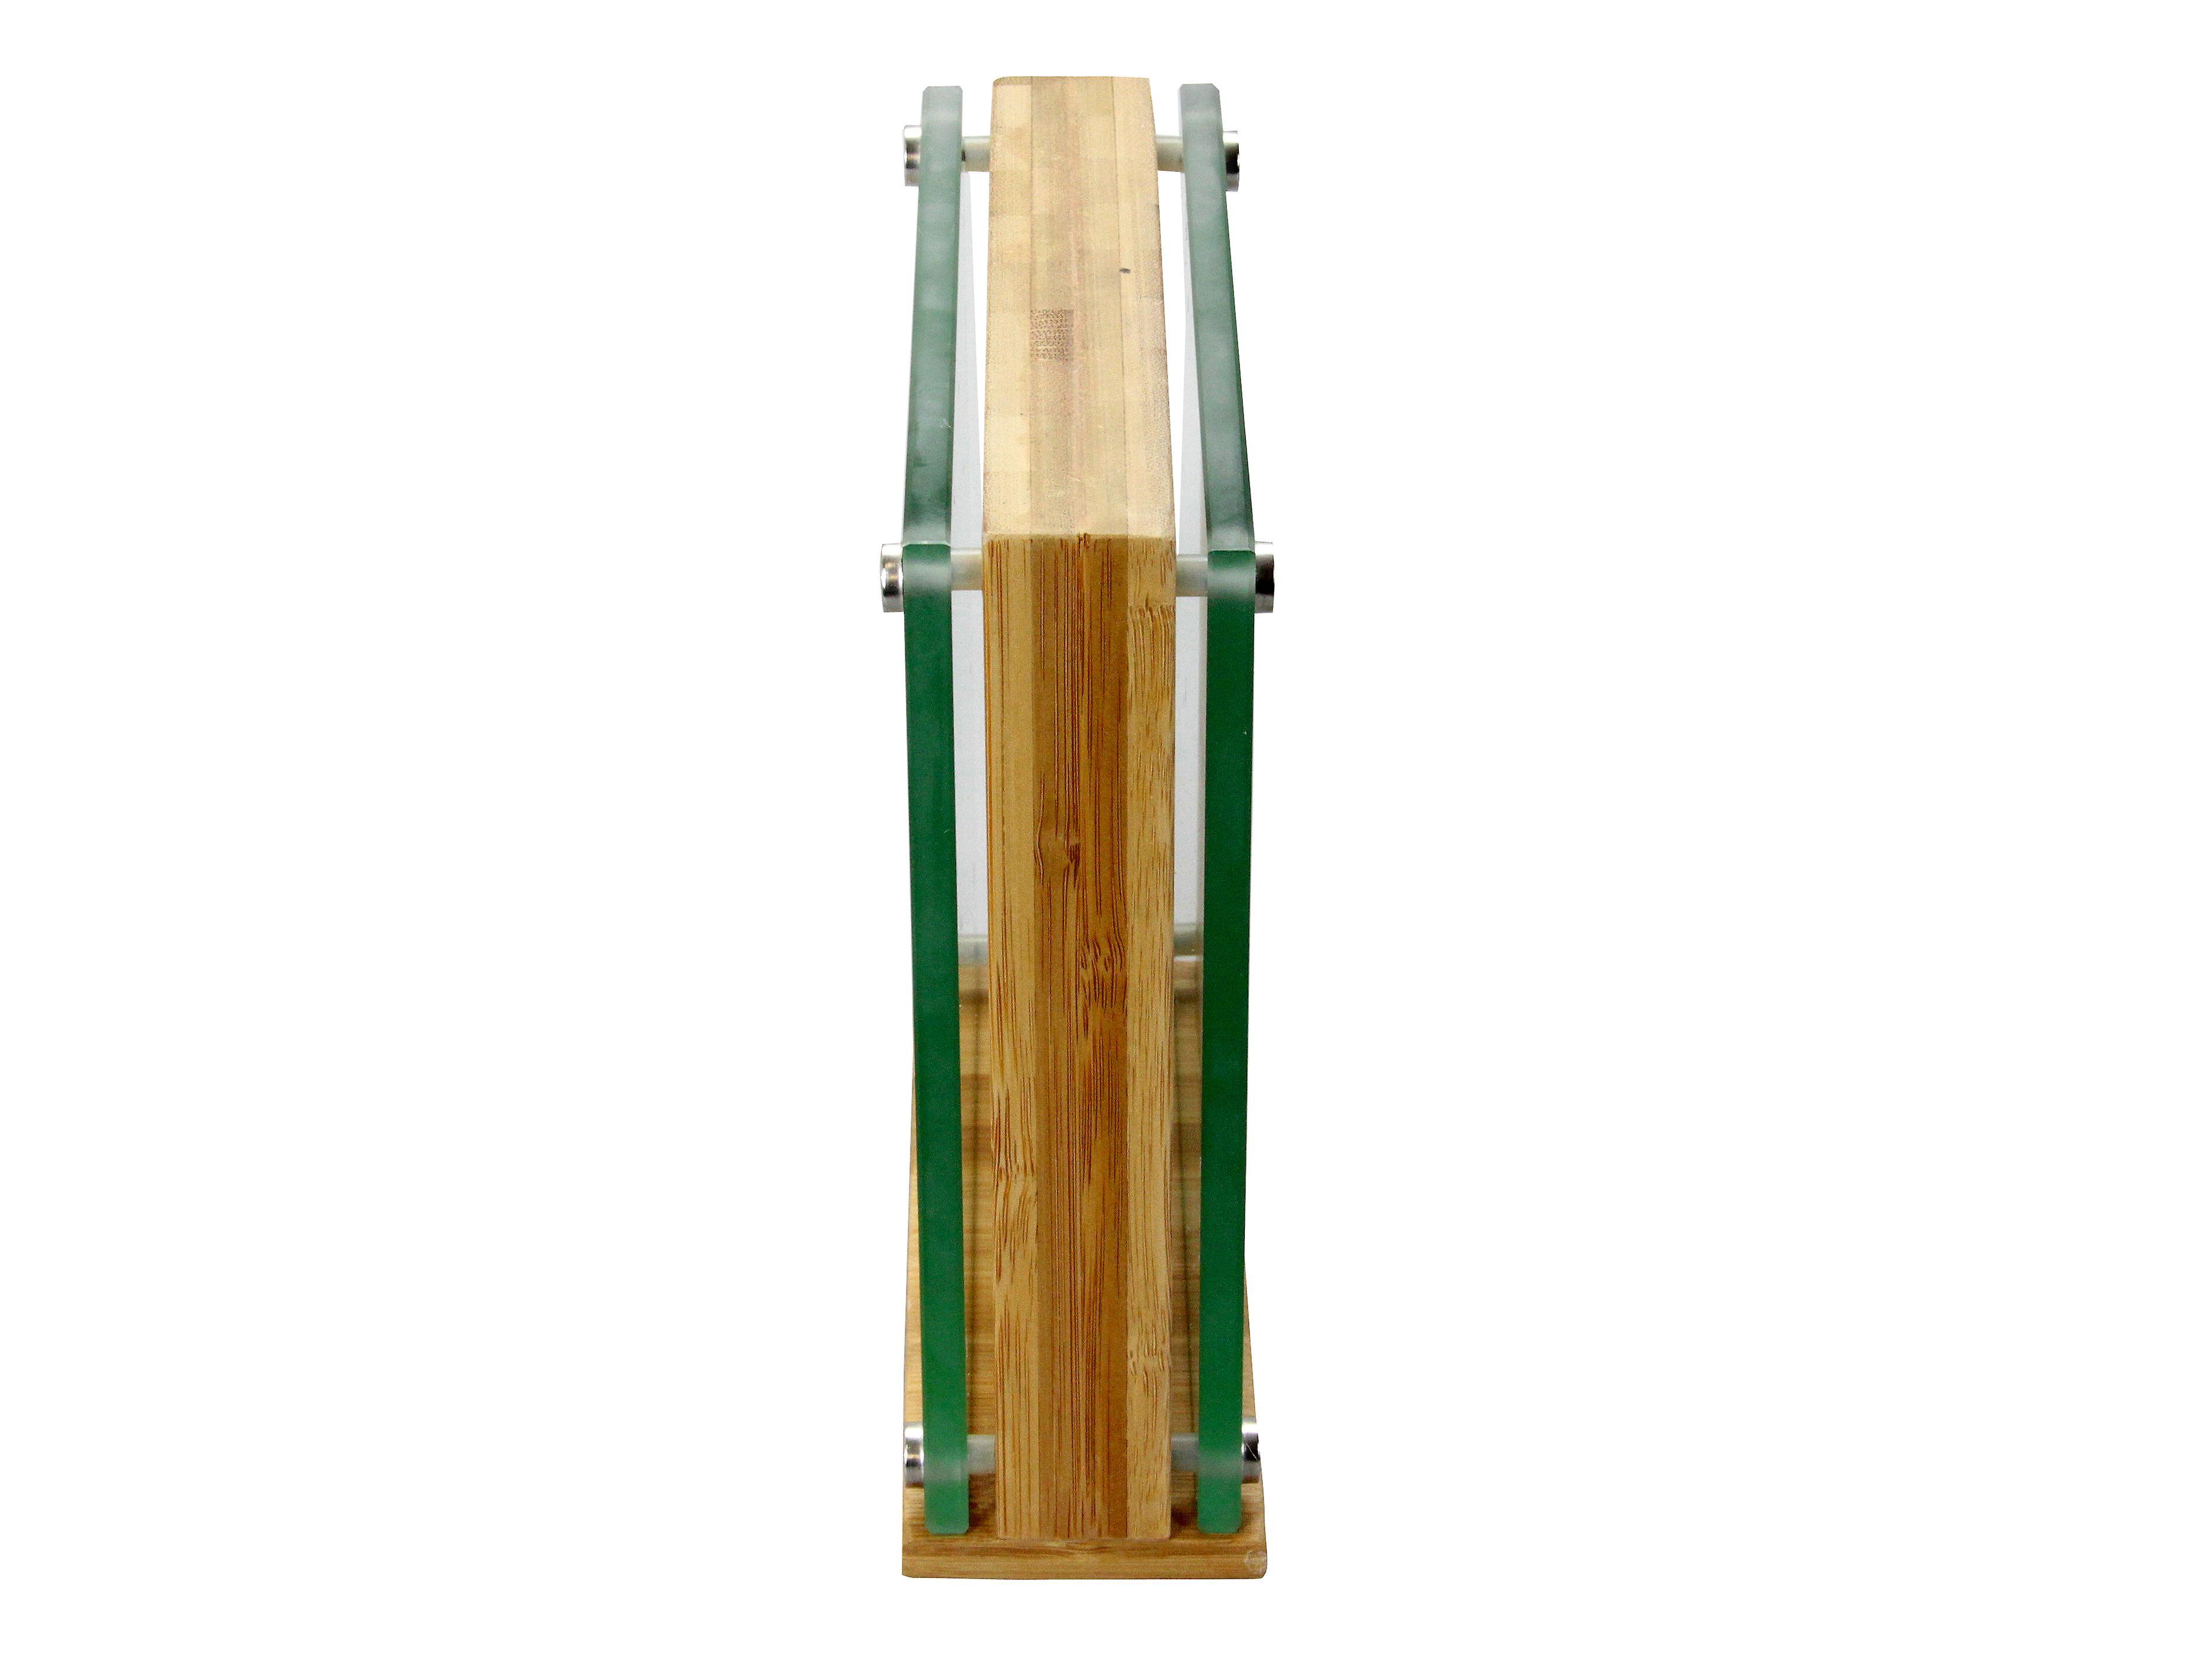 Woodquail Bamboo & Glass Magnetic Knife Block, Universal Knife Storage